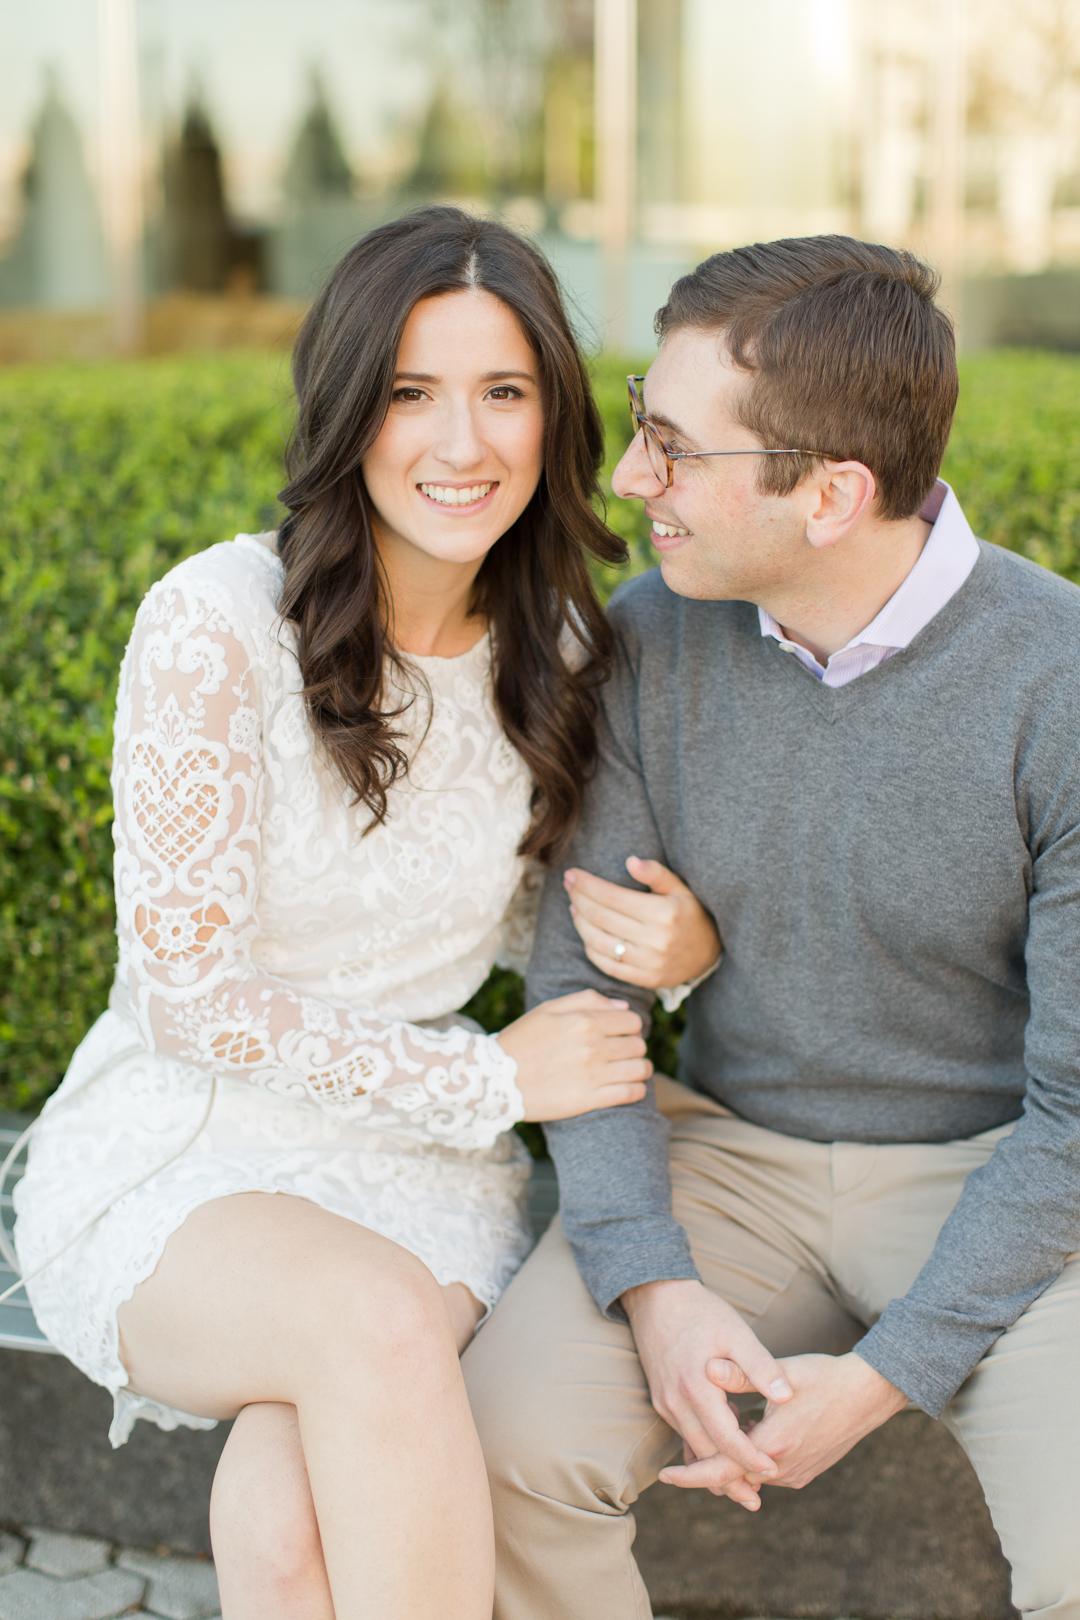 Melissa Kruse Photography - Christina & Alex Kips Bay Engagement Photos-41.jpg